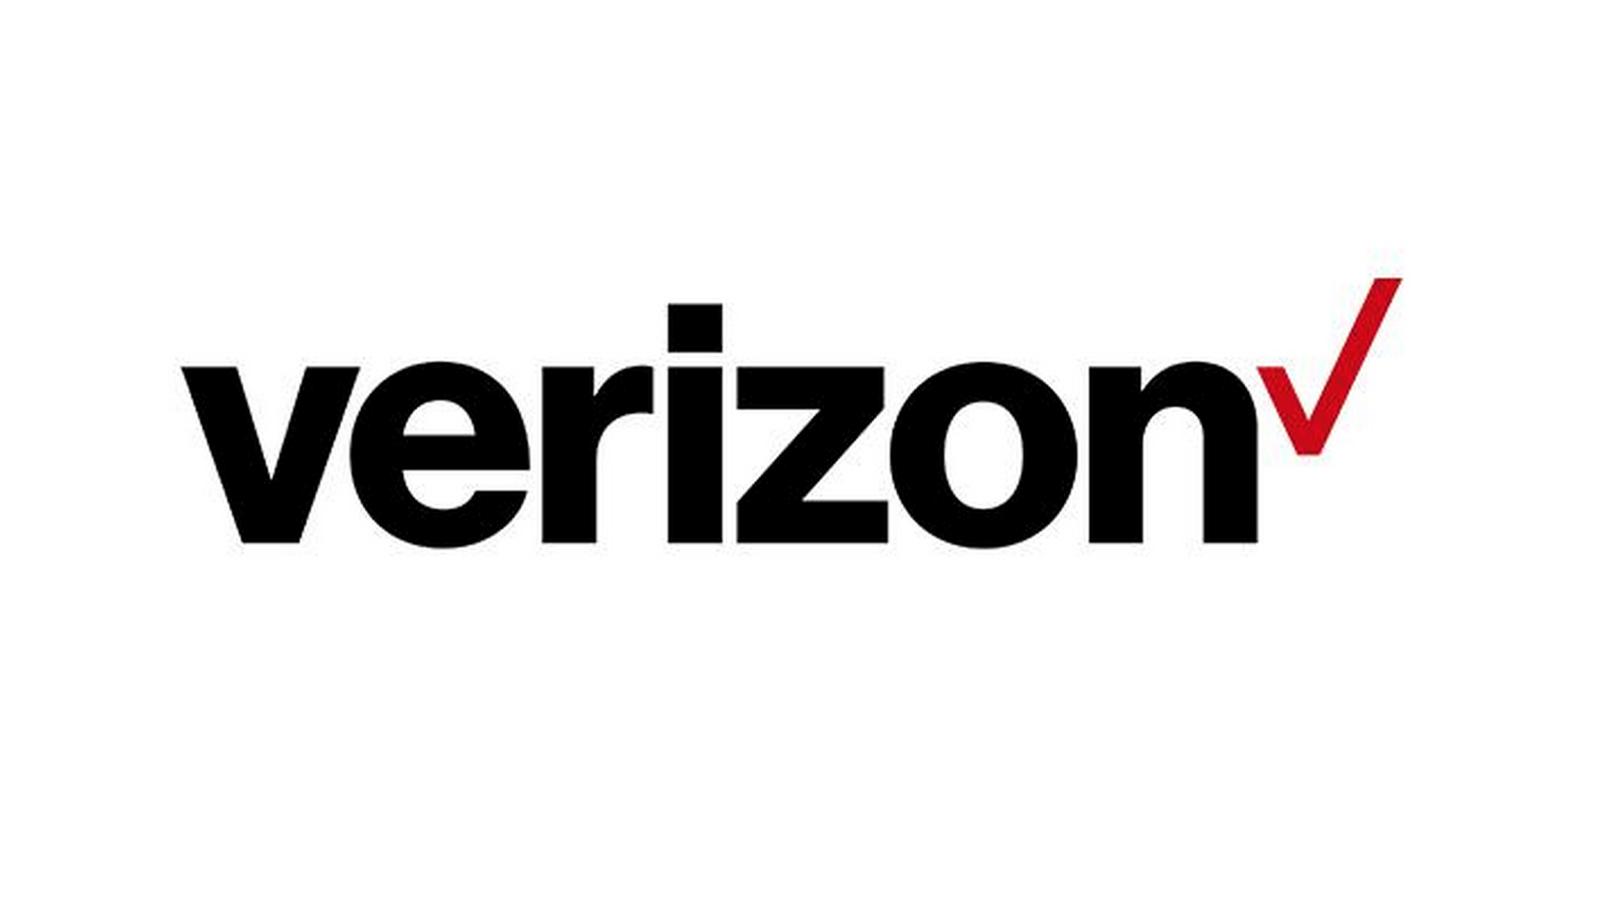 Verizon image 2